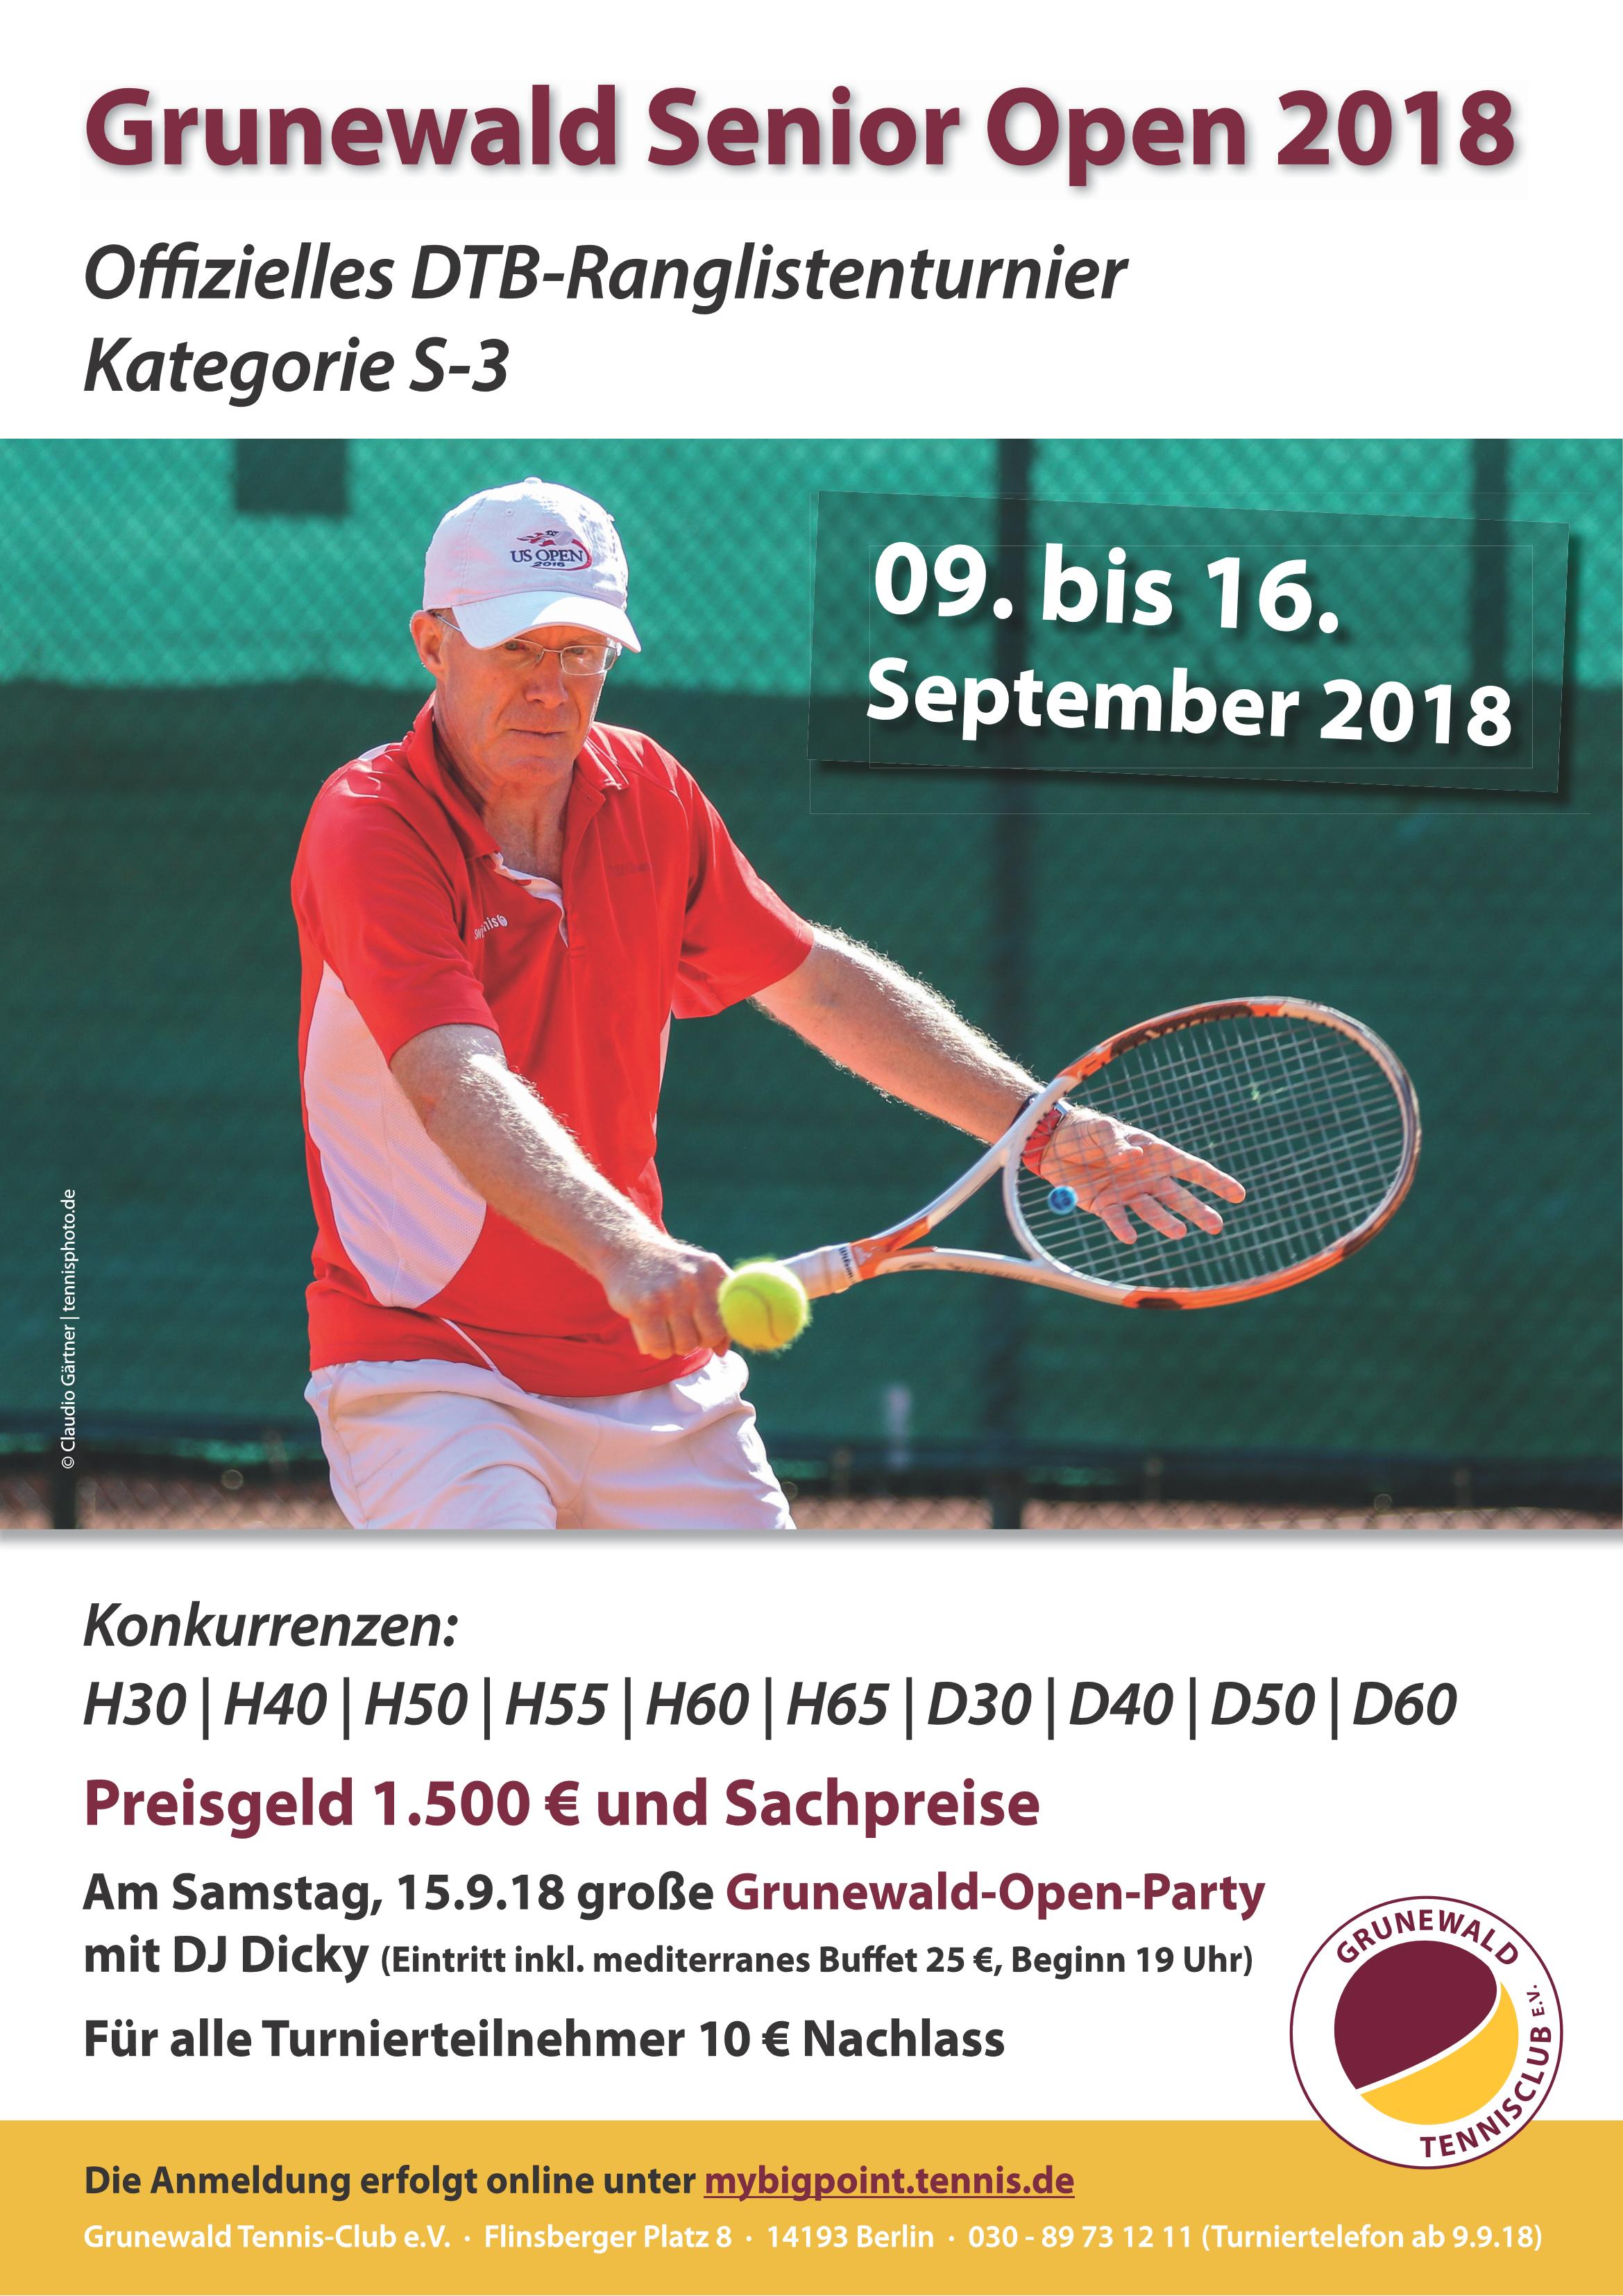 Grunewald Senior Open 2018